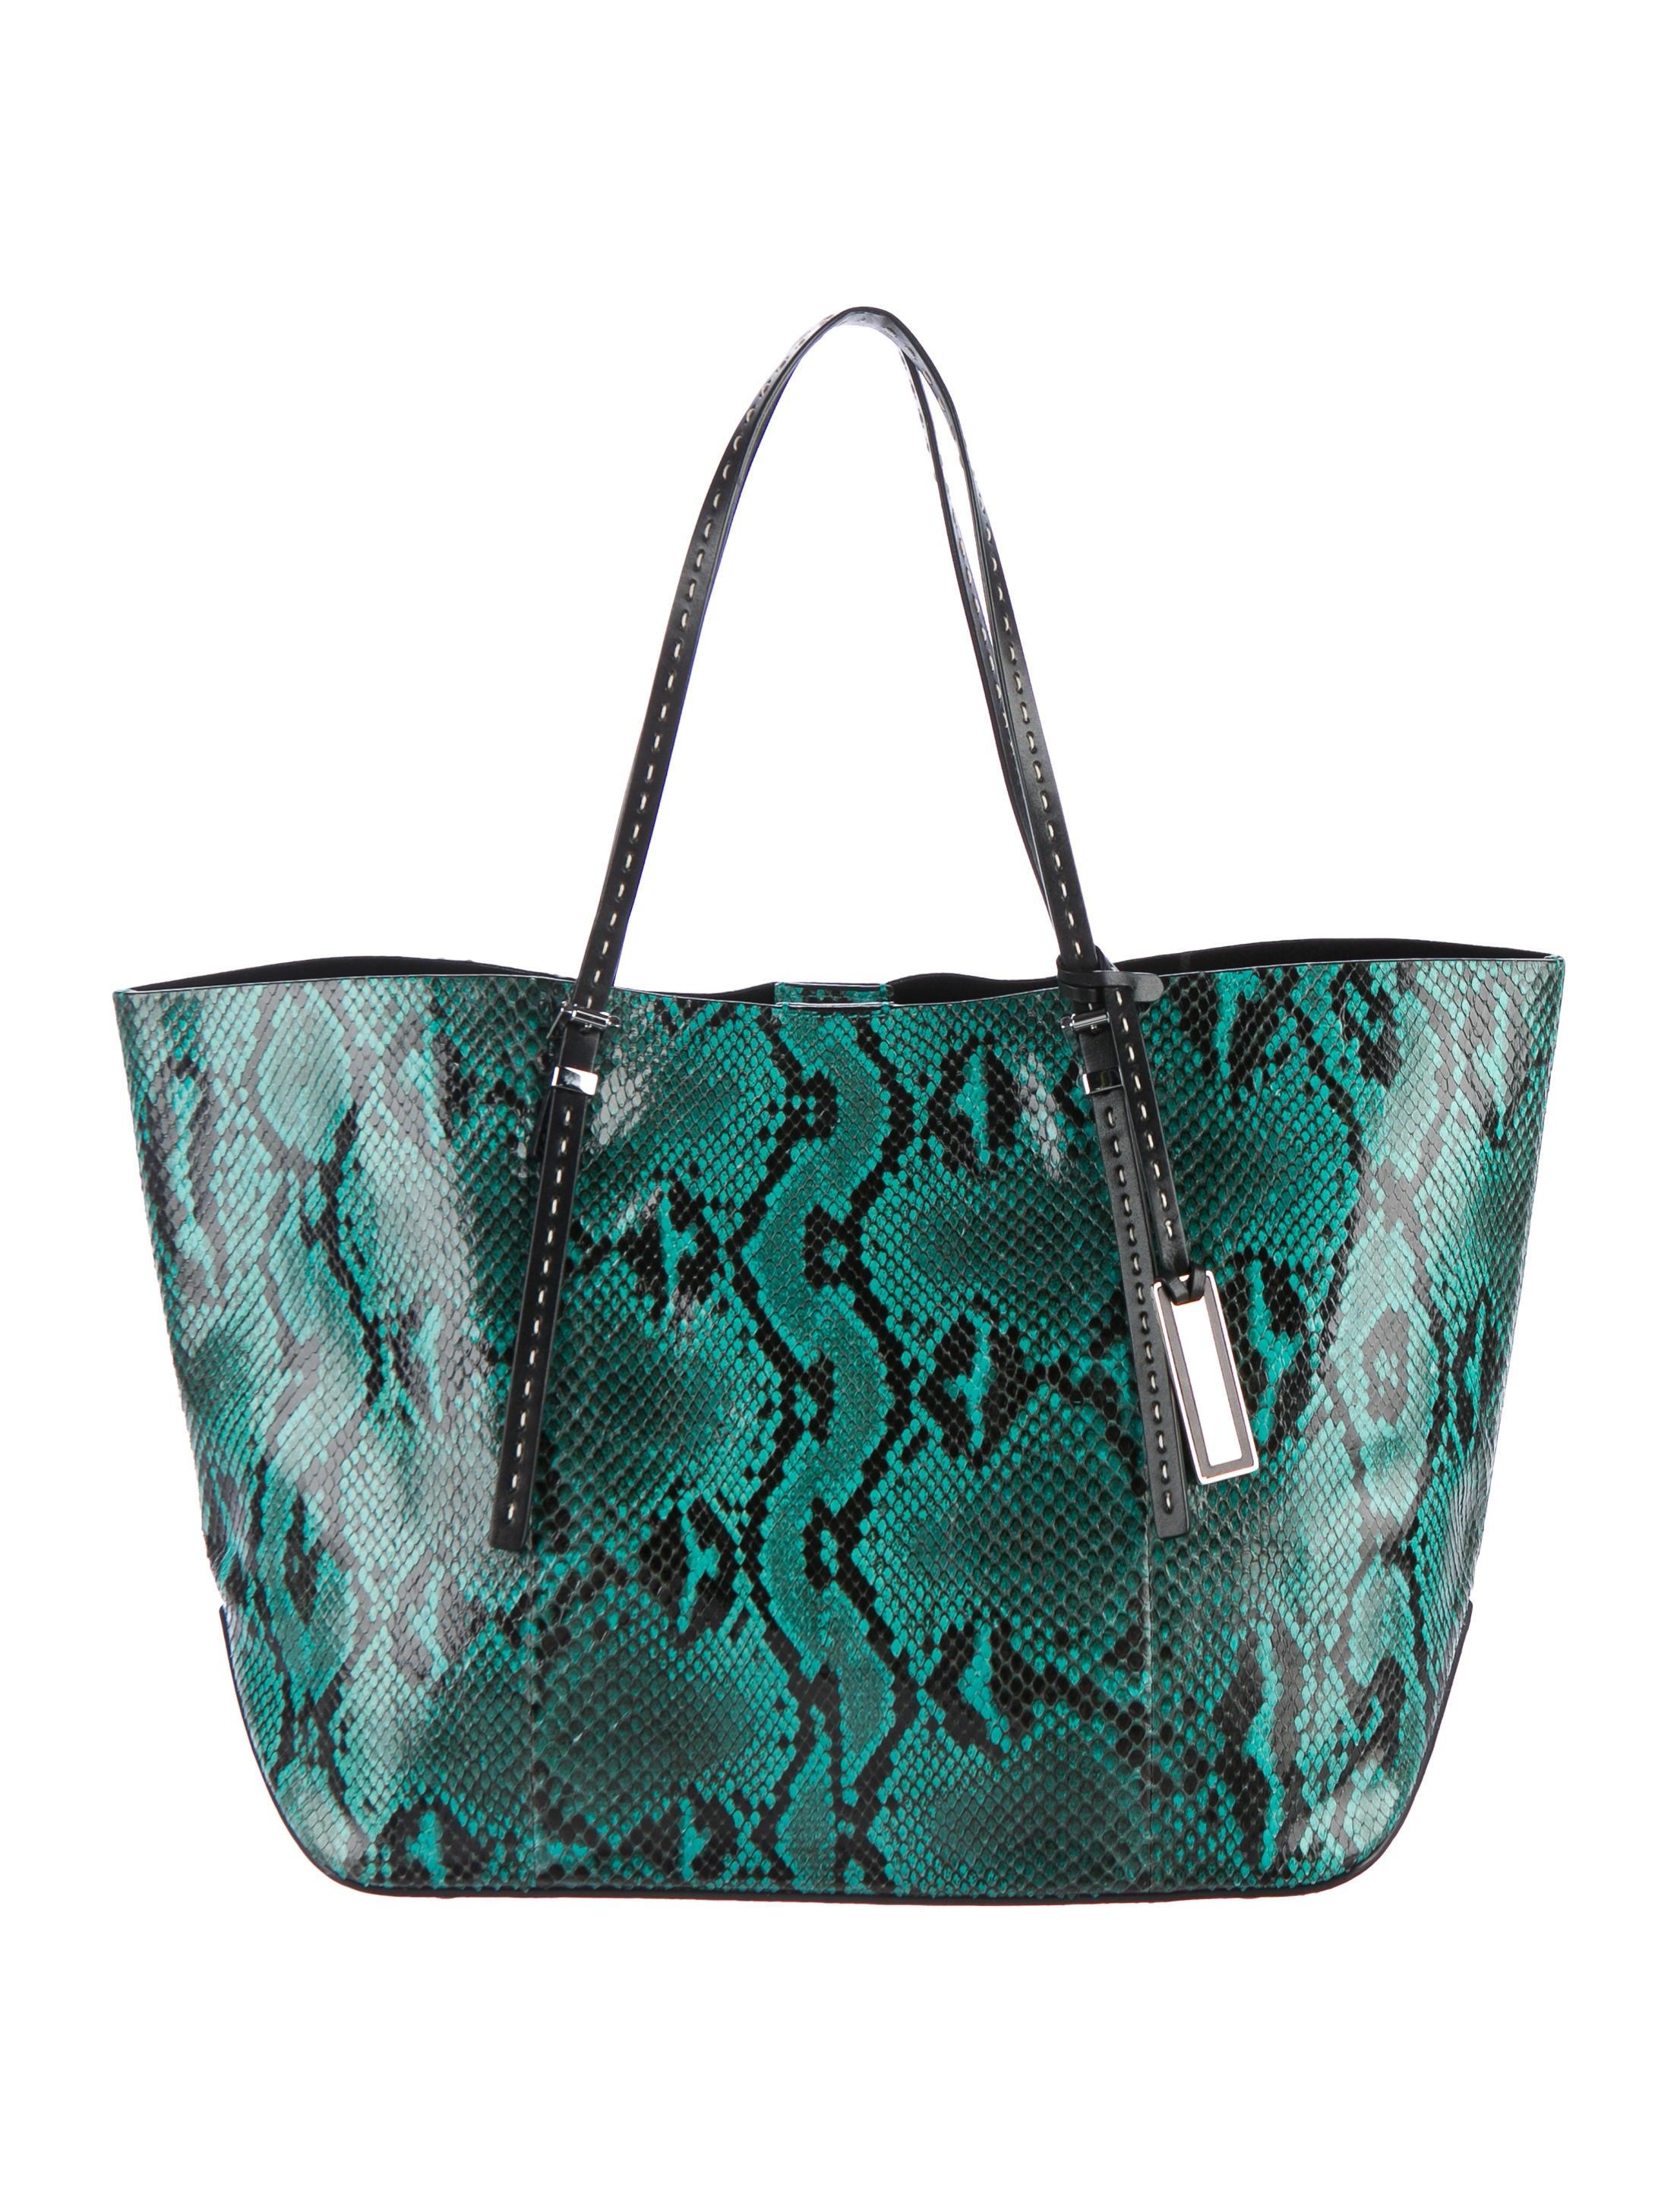 b2ecb81414850c Michael Kors 2015 Jaryn Python Tote - Handbags - MIC58199 | The RealReal